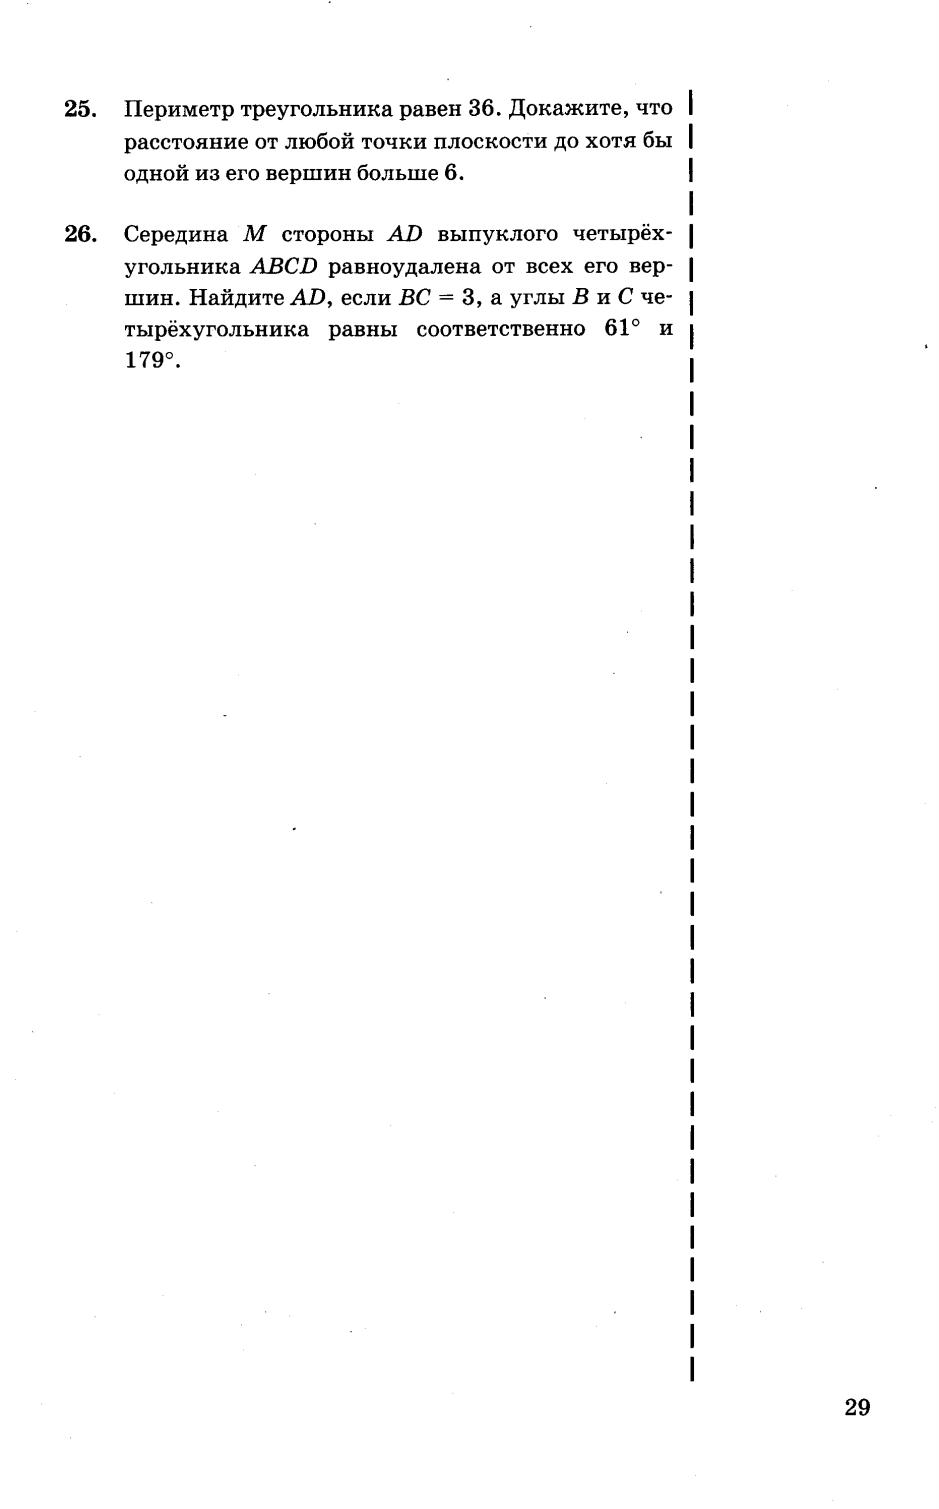 https://docs.google.com/viewer?pid=explorer&srcid=0Bw_f54pvrxEtbldKNGgyaFE3TDg&chrome=false&docid=e803bf4555b2fe7a8e01072ad16bc93b%7Cc9acad21277b9c8c76d1236b5bcea6e2&a=bi&pagenumber=30&w=939